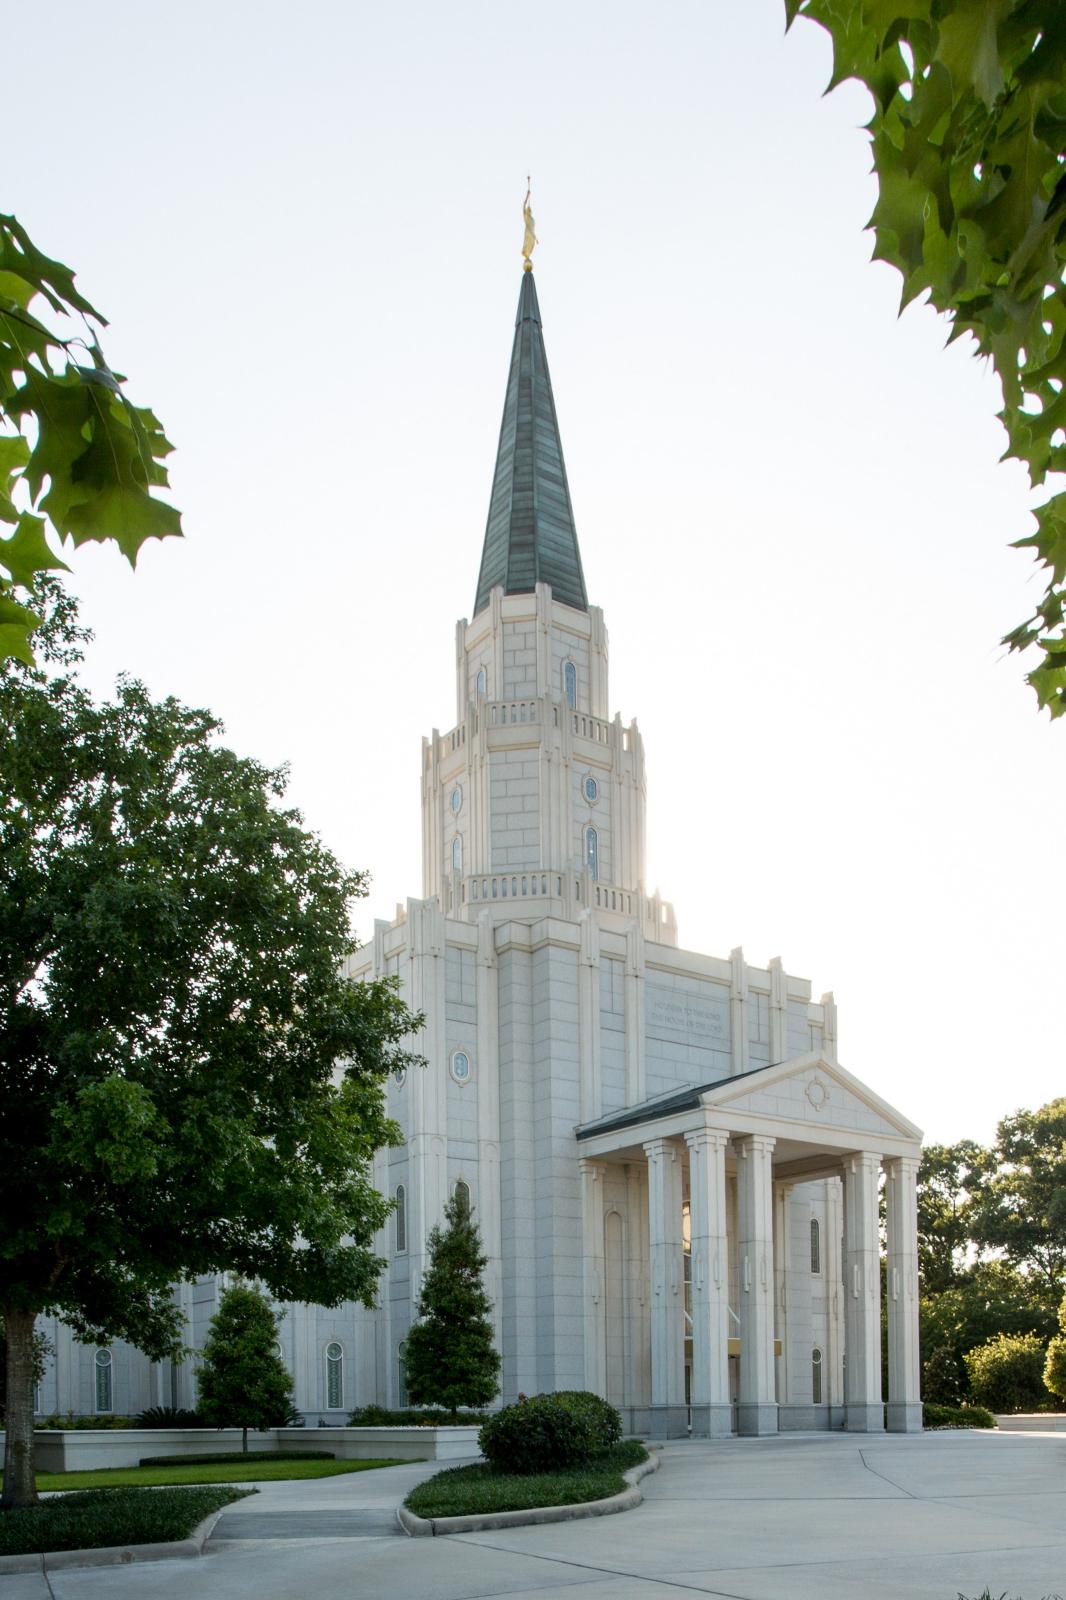 houston texas lds temple 1163248 wallpaperjpg 1066x1600